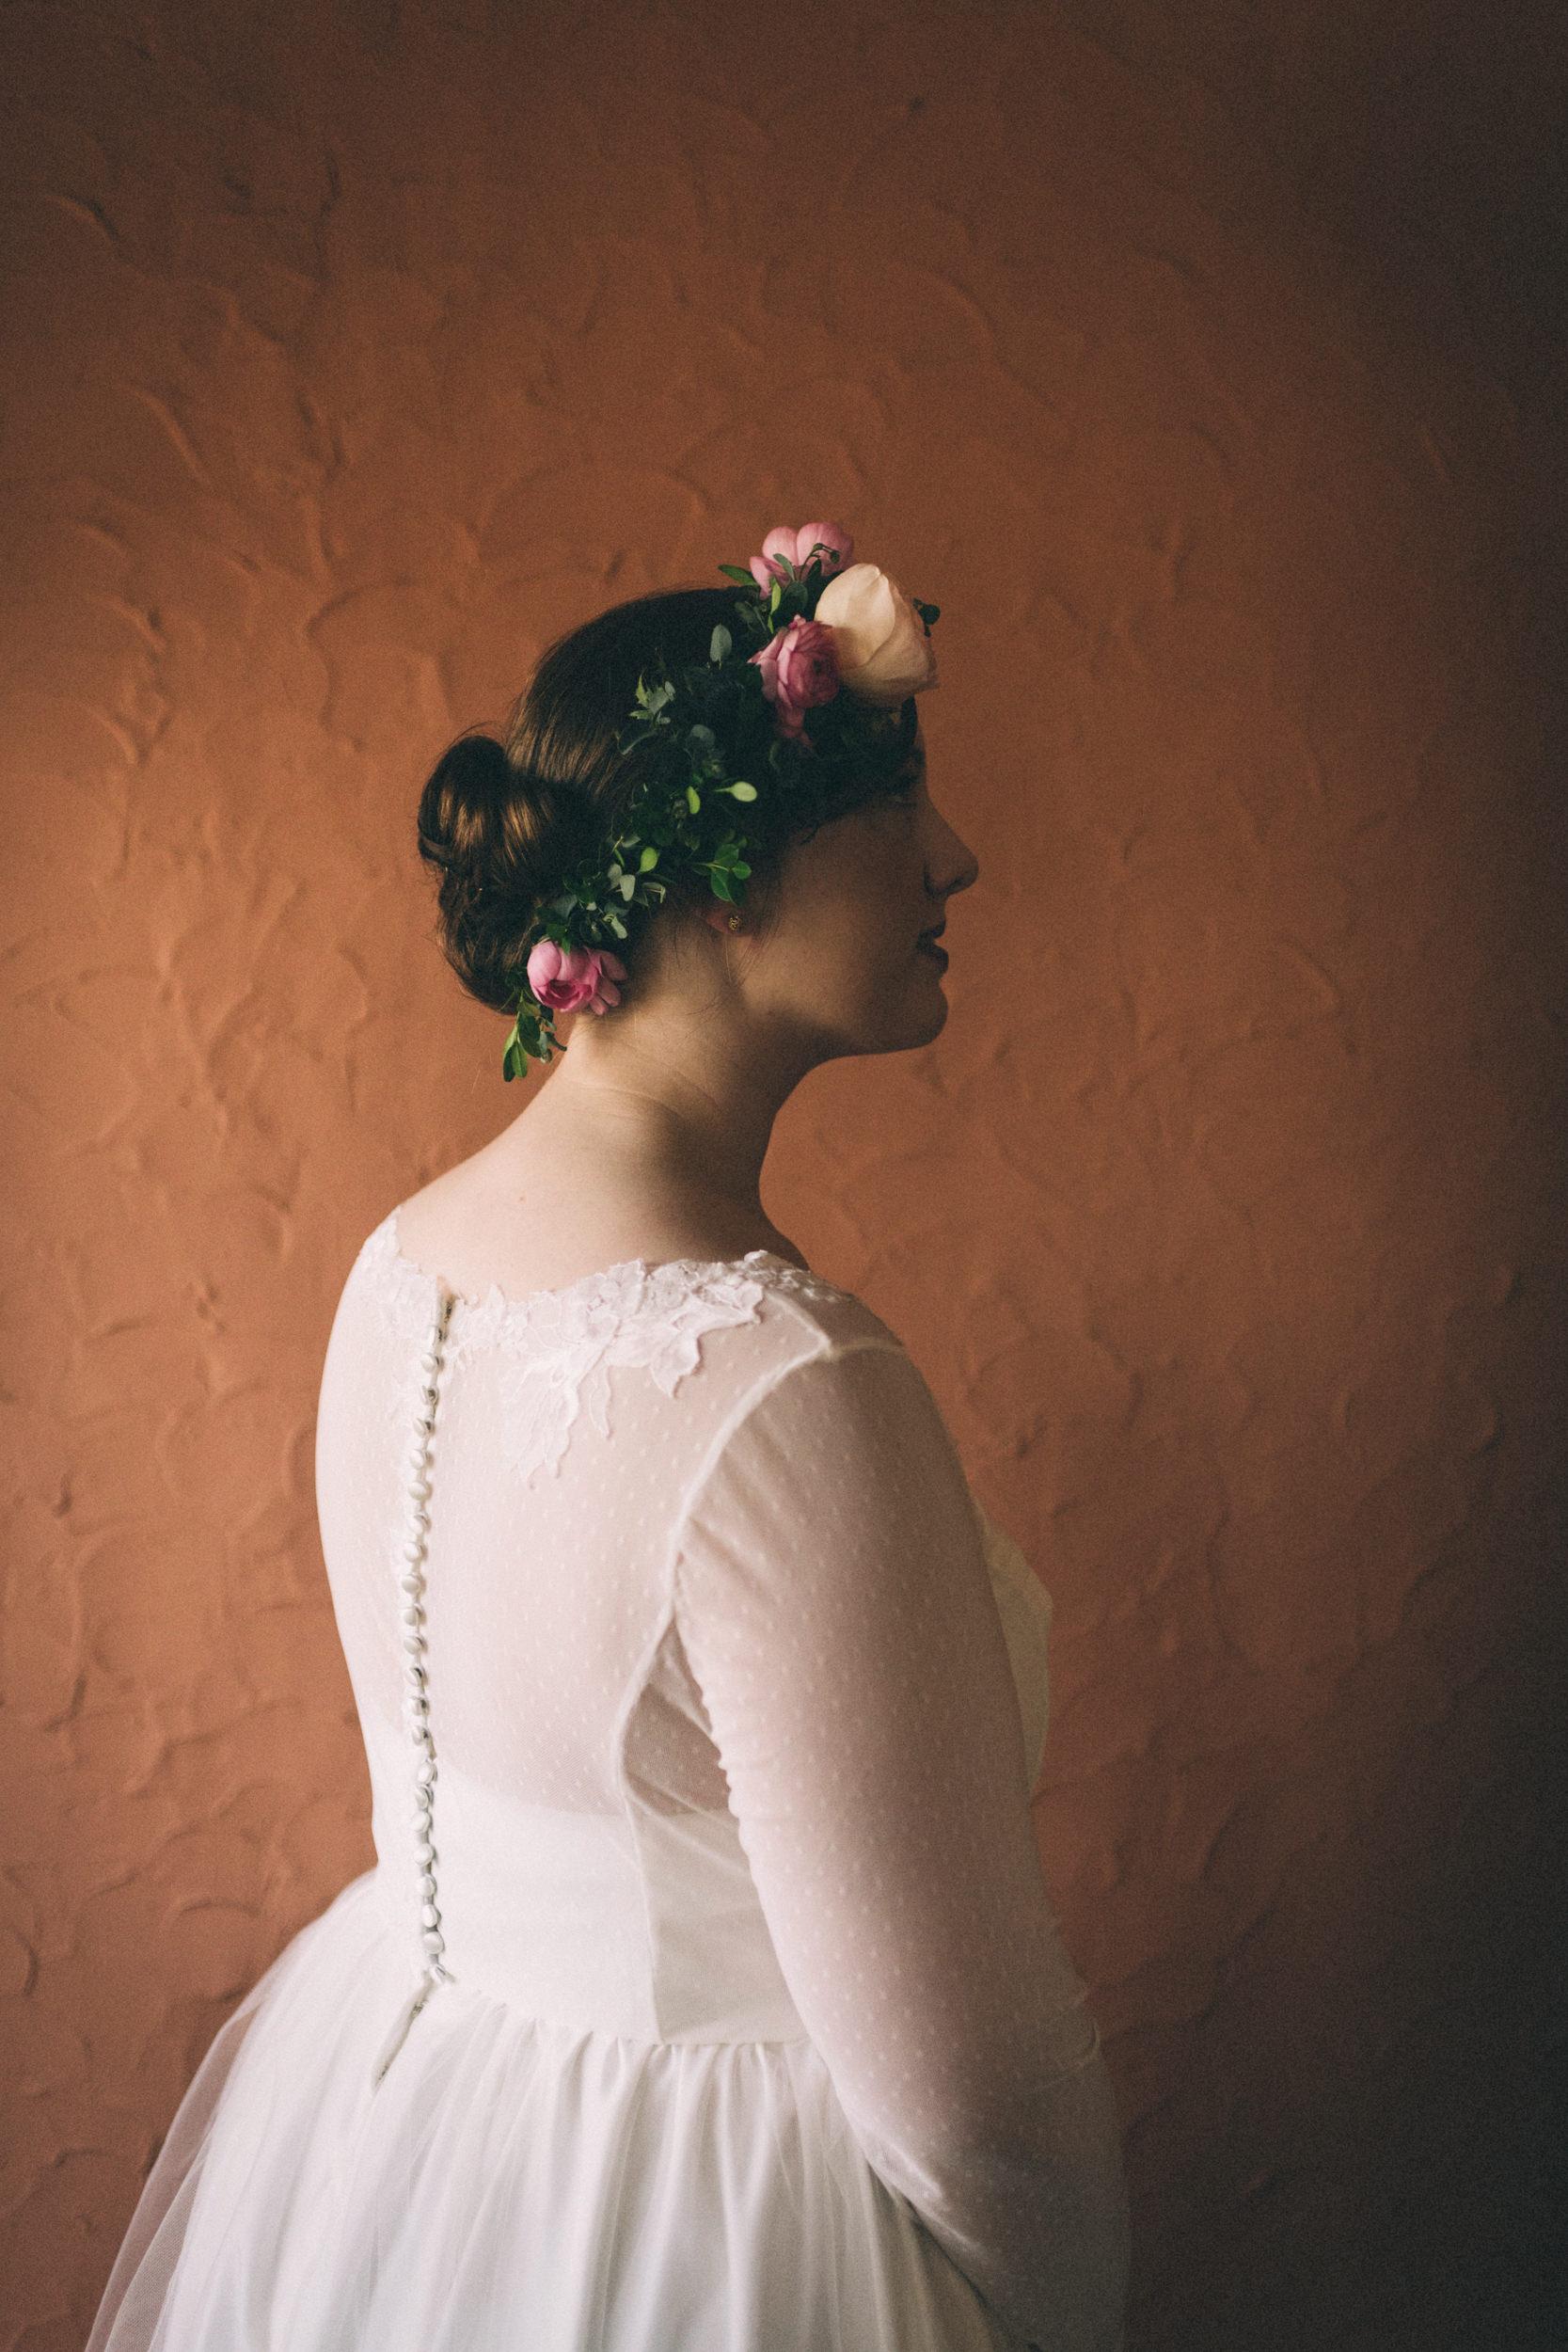 lauren-dean-wedding-grand-lodge-kentucky-sarah-katherine-davis-photography-124edit.jpg